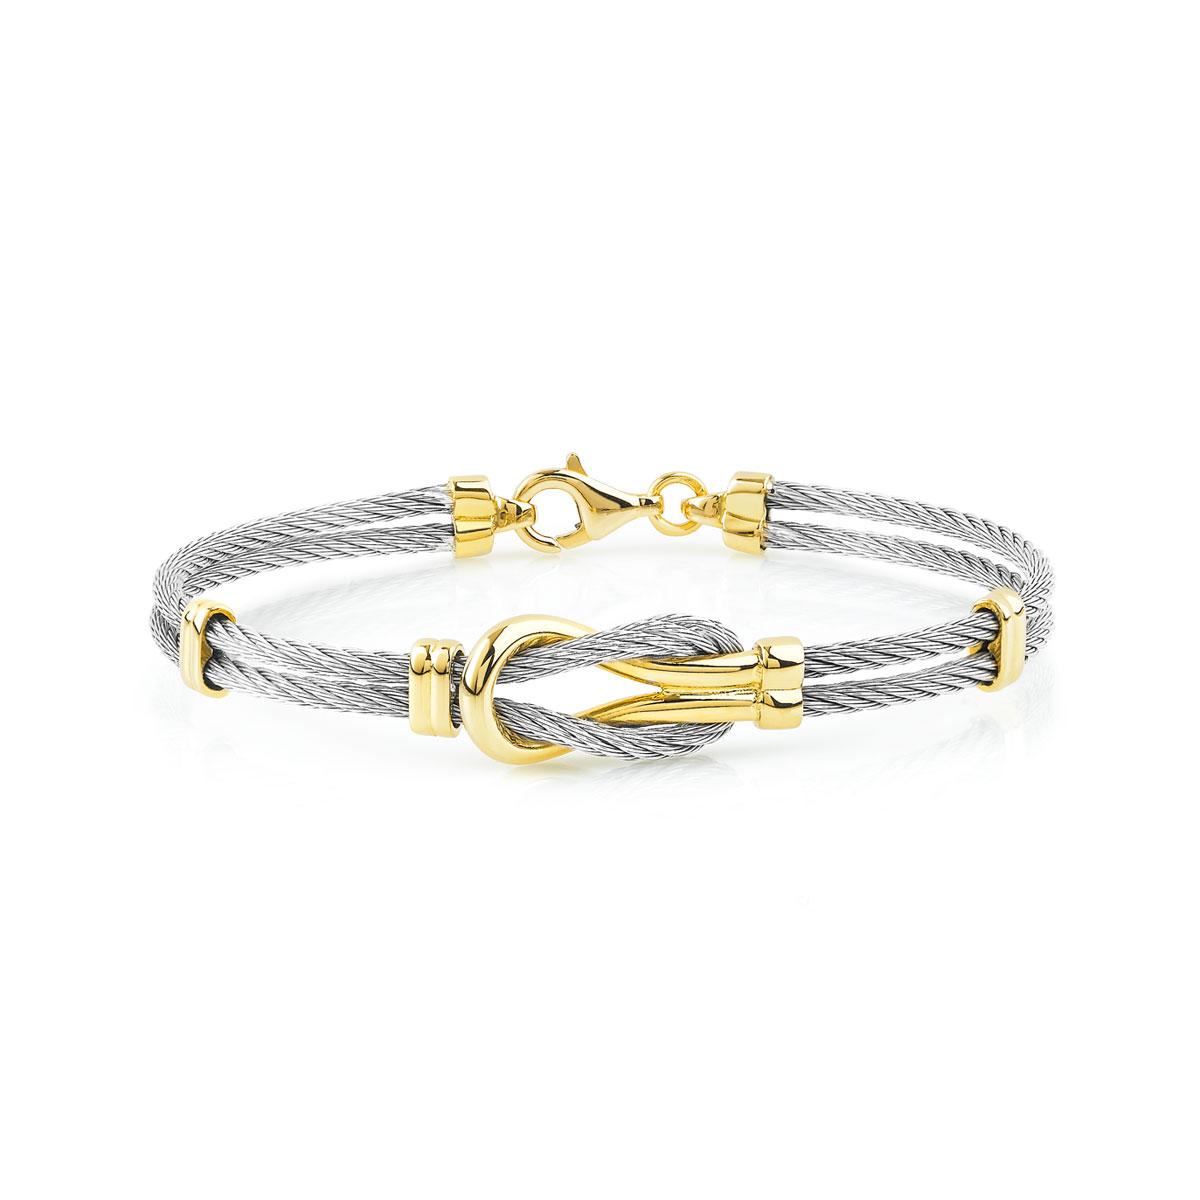 Bracelet acier et or 375 jaune